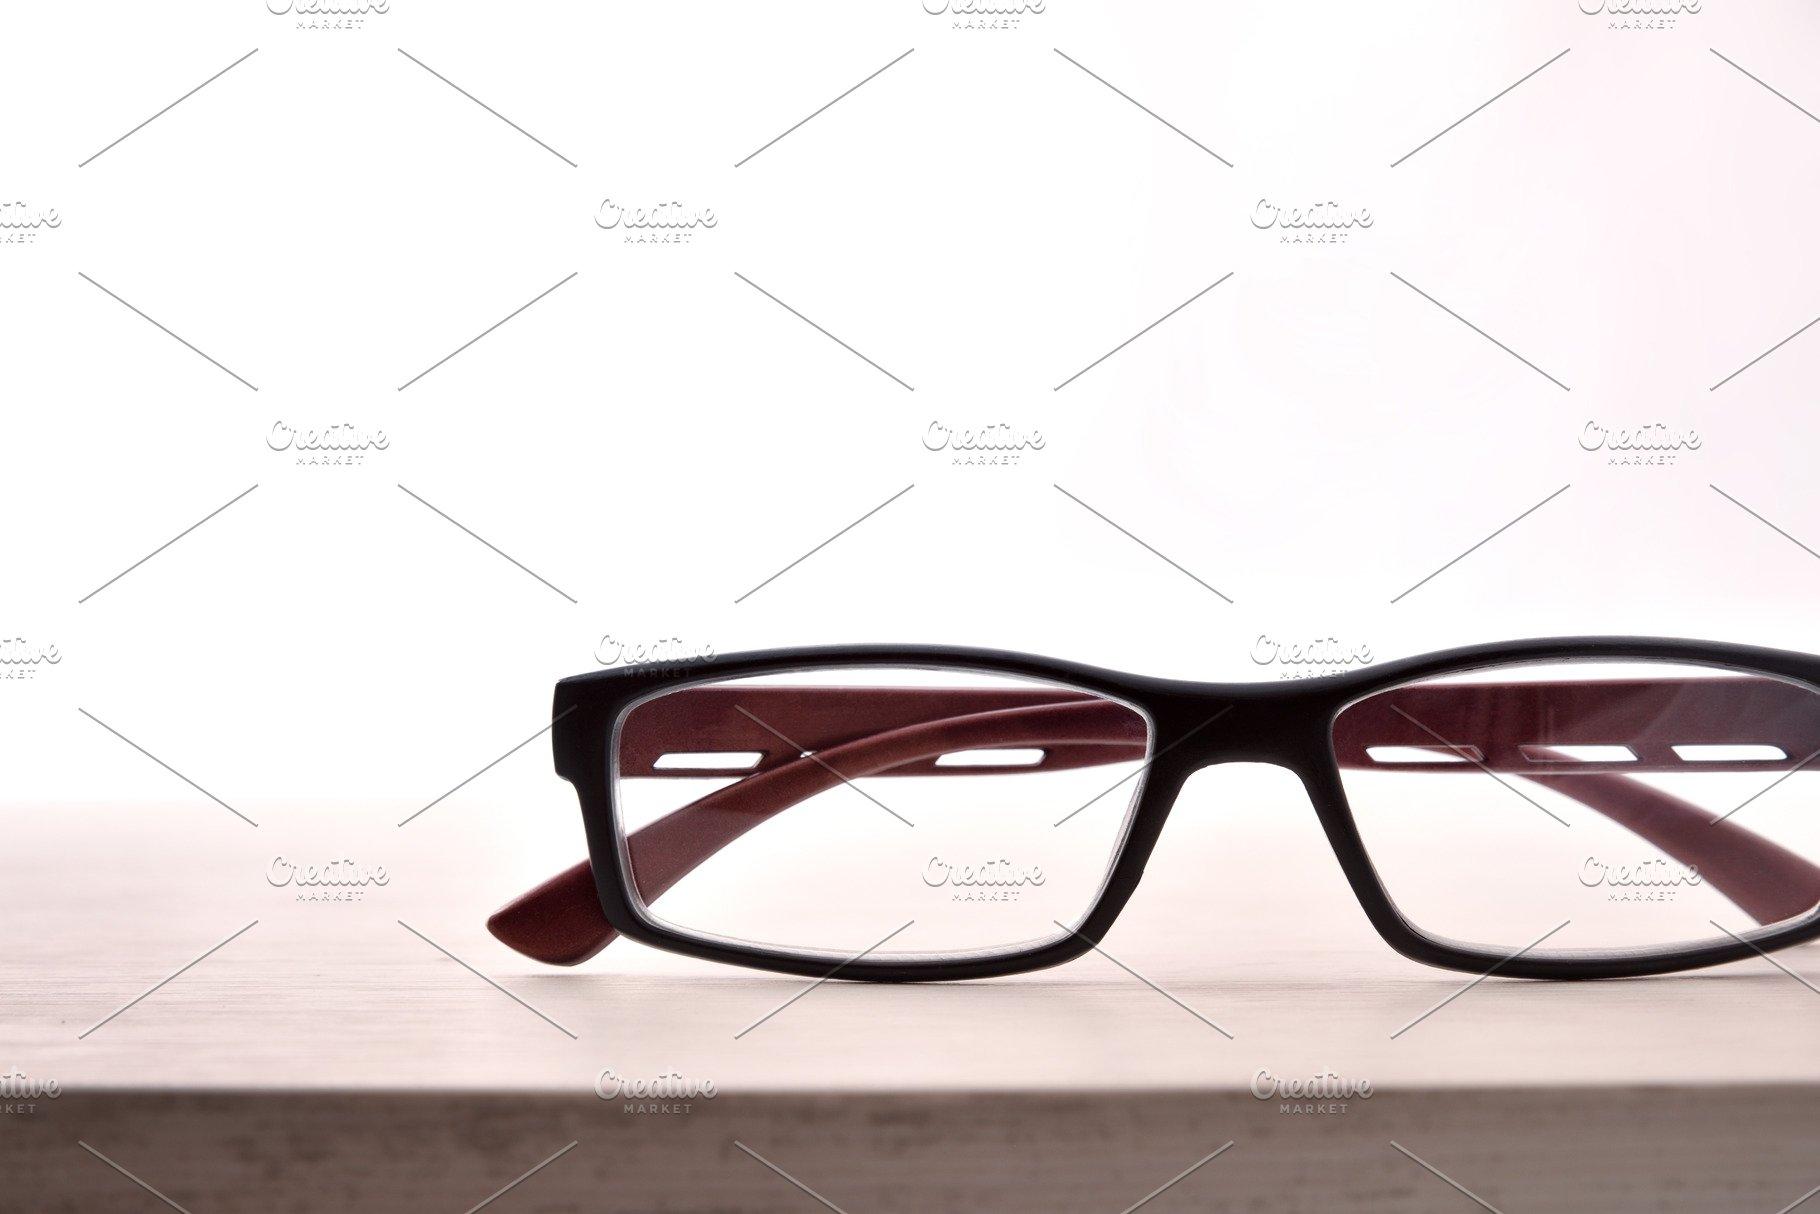 79b75155a82a Eyewear on table white background ~ Arts & Entertainment Photos ~ Creative  Market